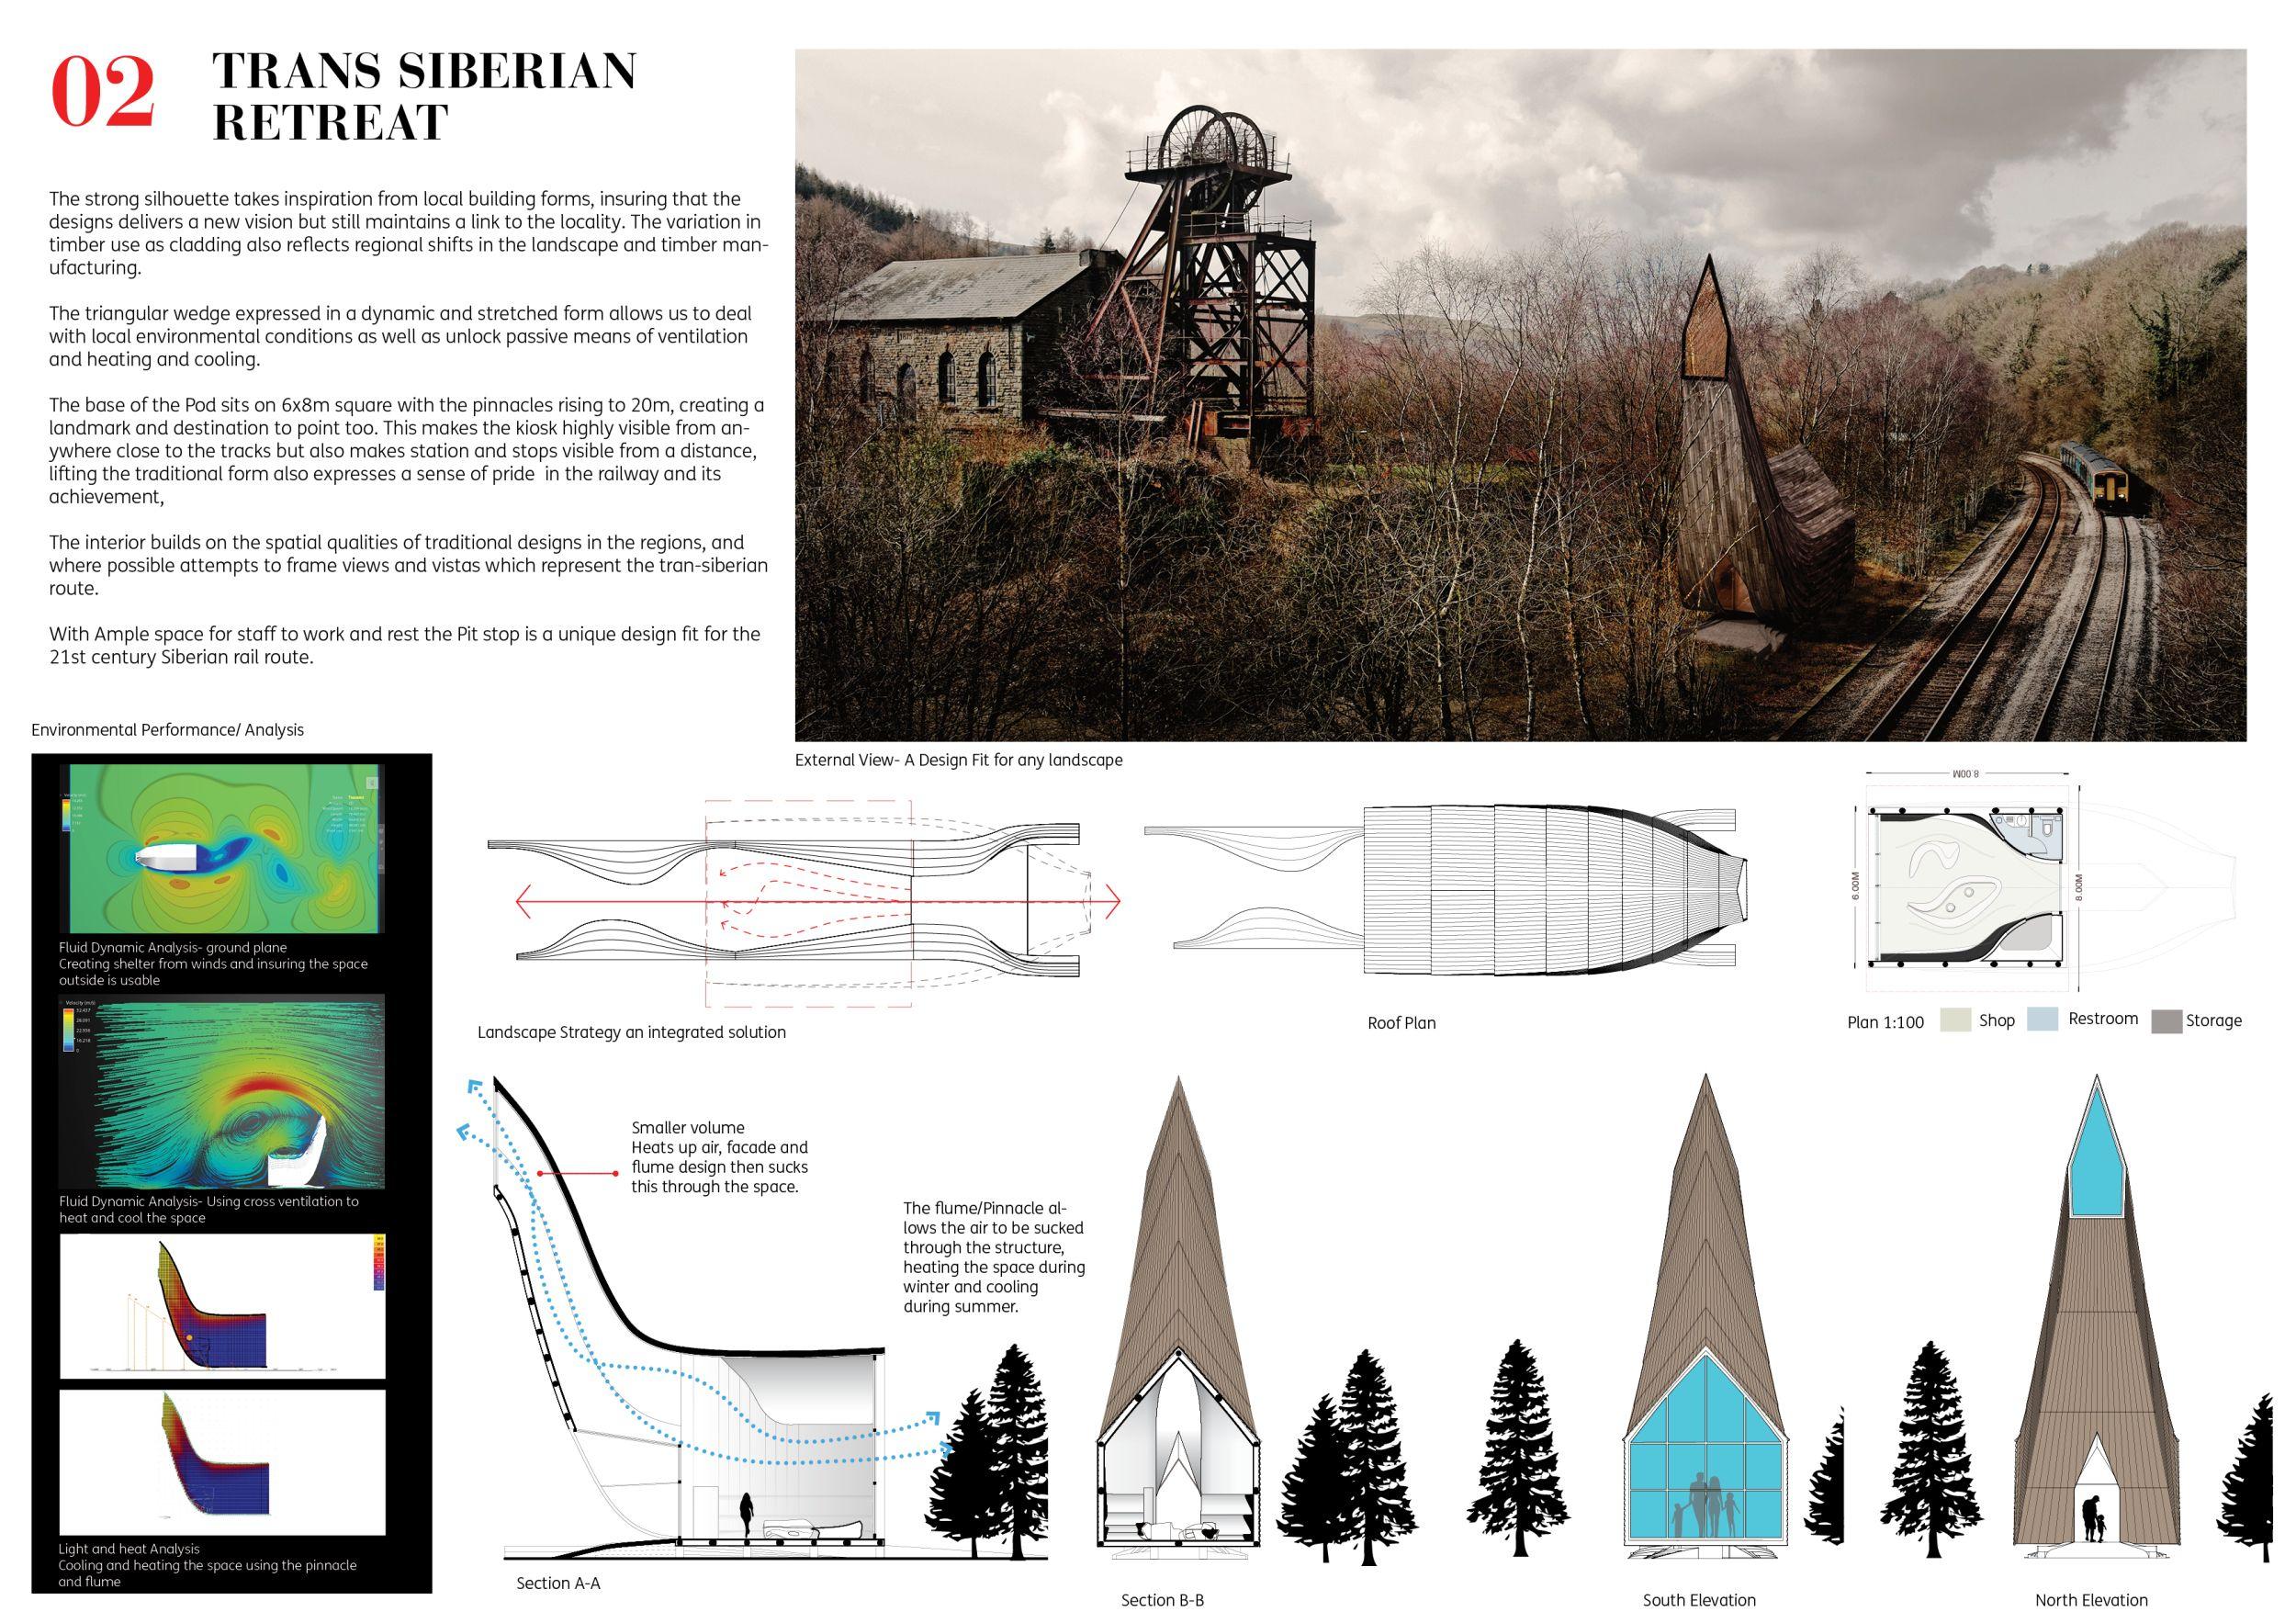 71bd22e744c2457932ac972b23b4a408 Jpg 2500 1767 Siberian Trans Siberian Innovative Architecture